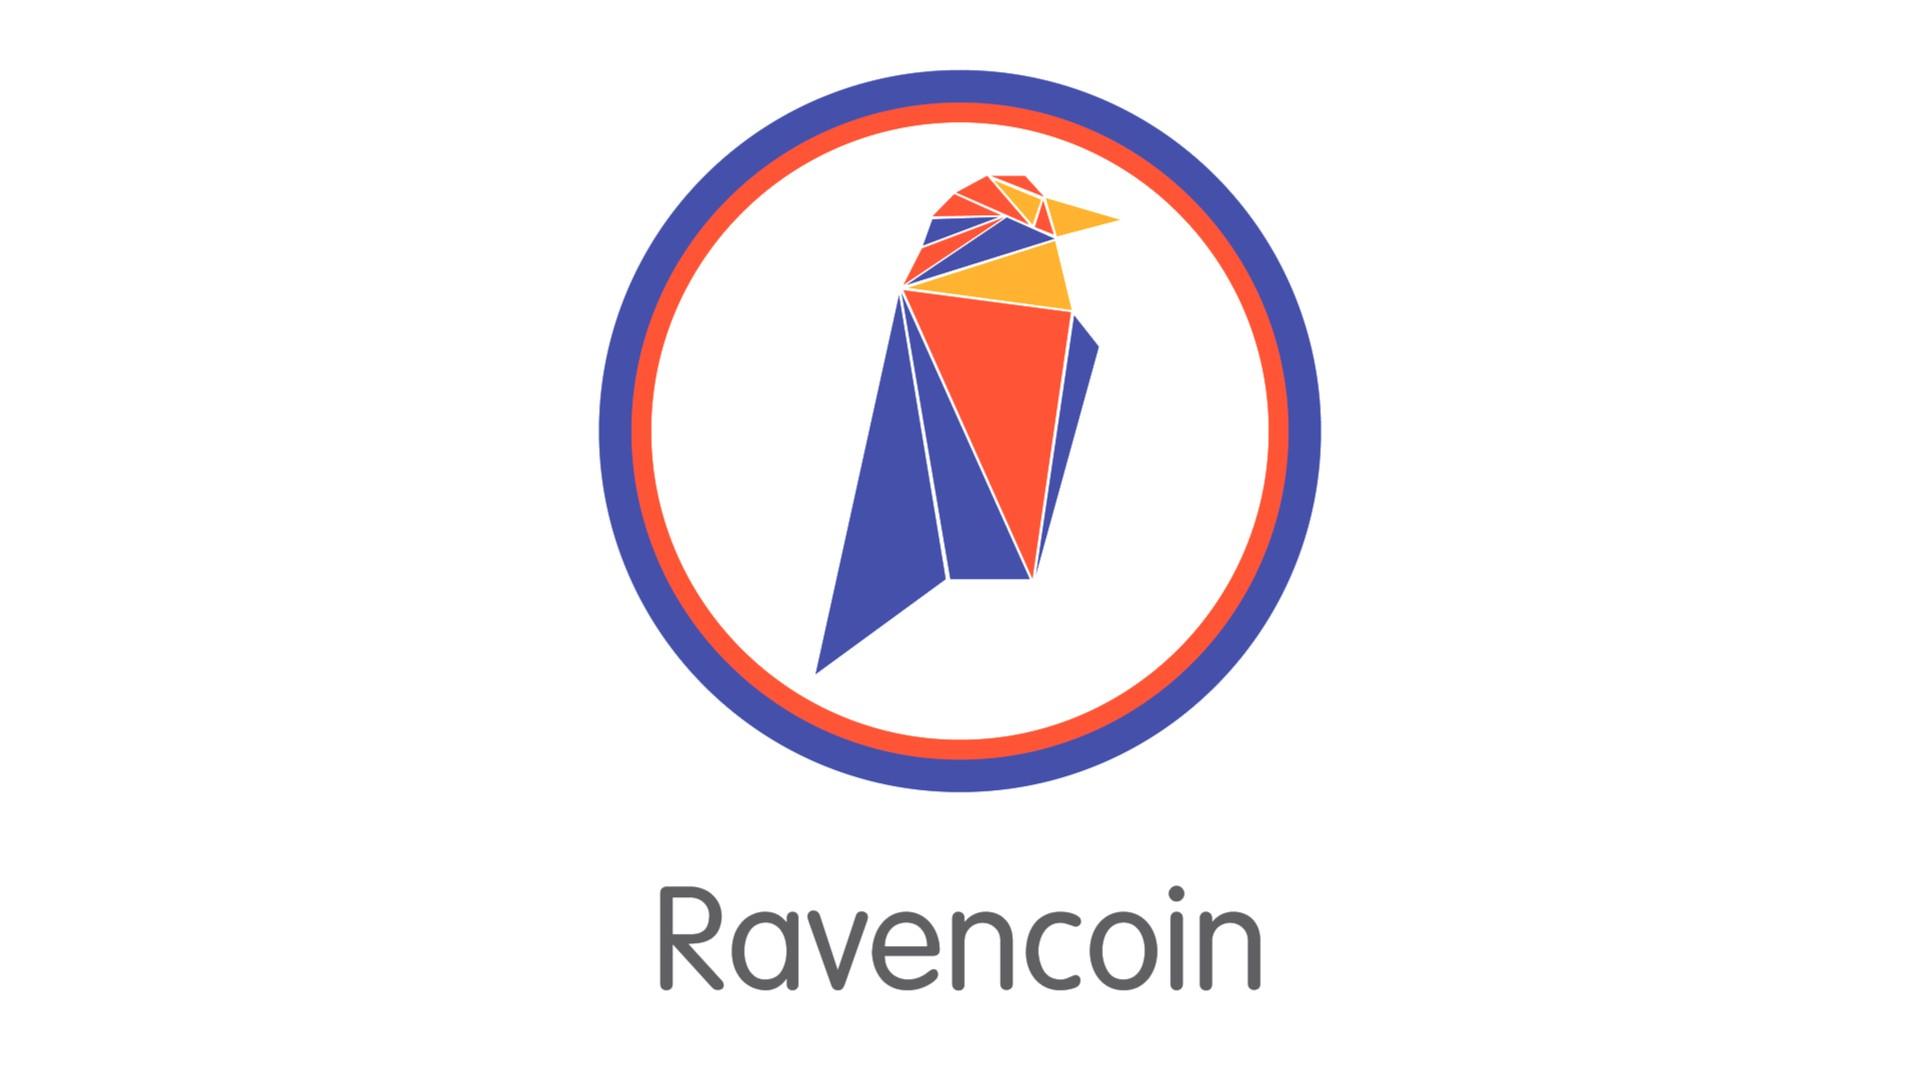 Ravencoin —股息/奖励